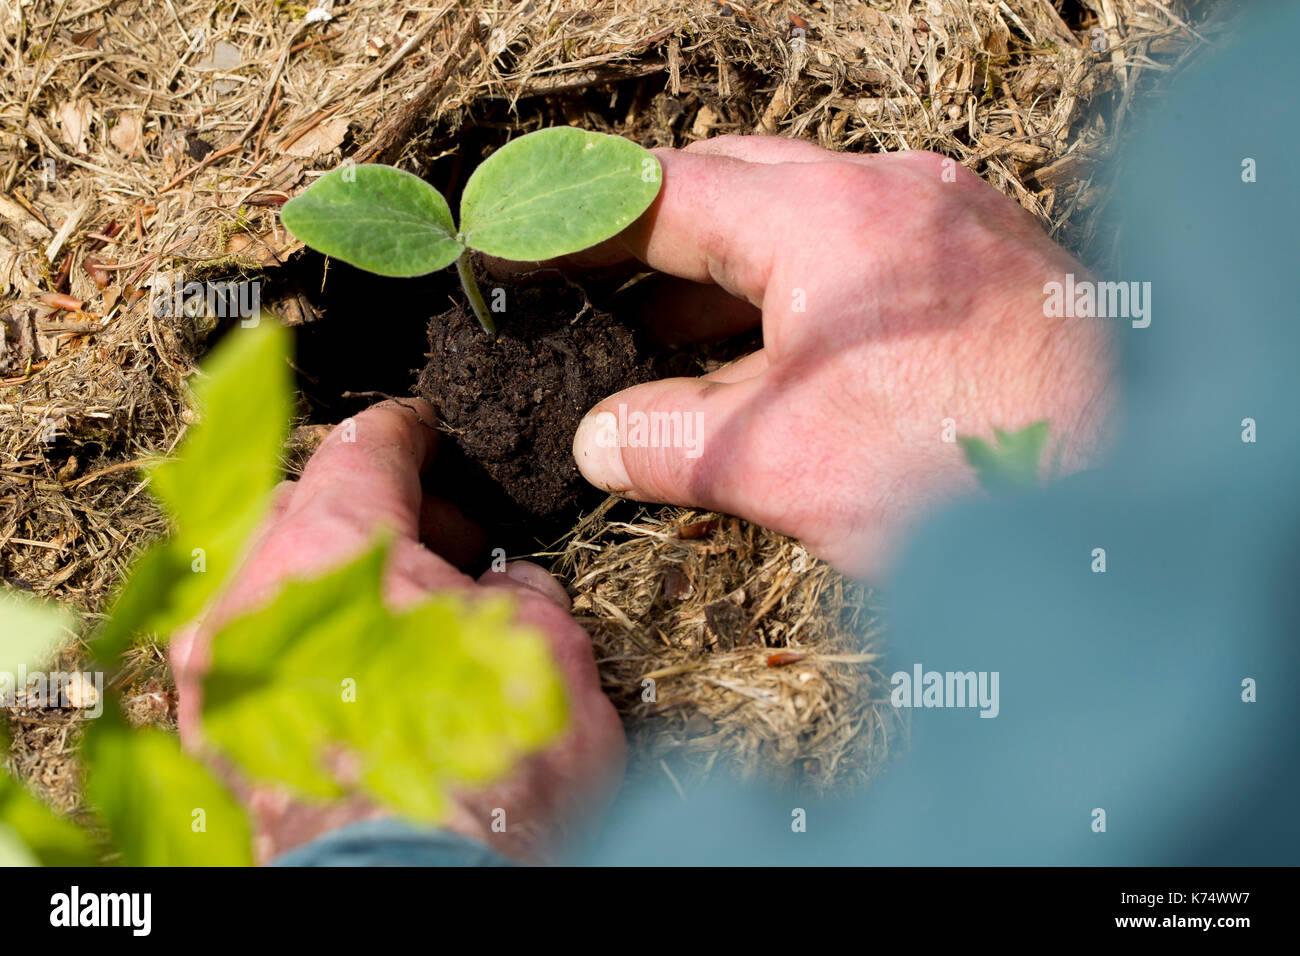 Gardening: man planting a plant shoot - Stock Image